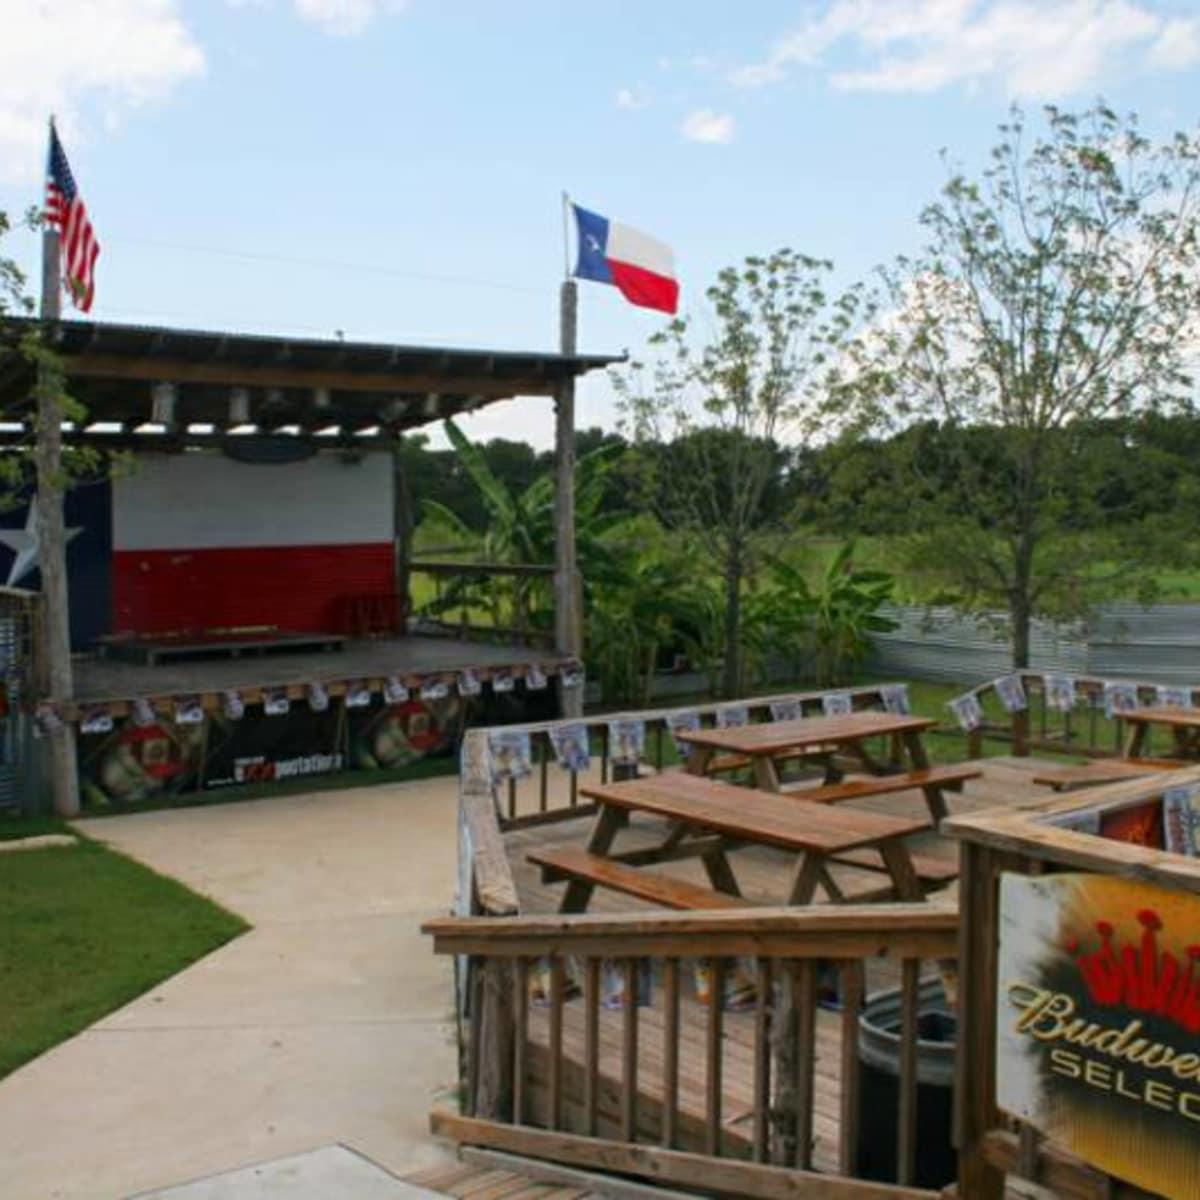 Austin_photo: places_drinks_cindy's gone hog wild_exterior